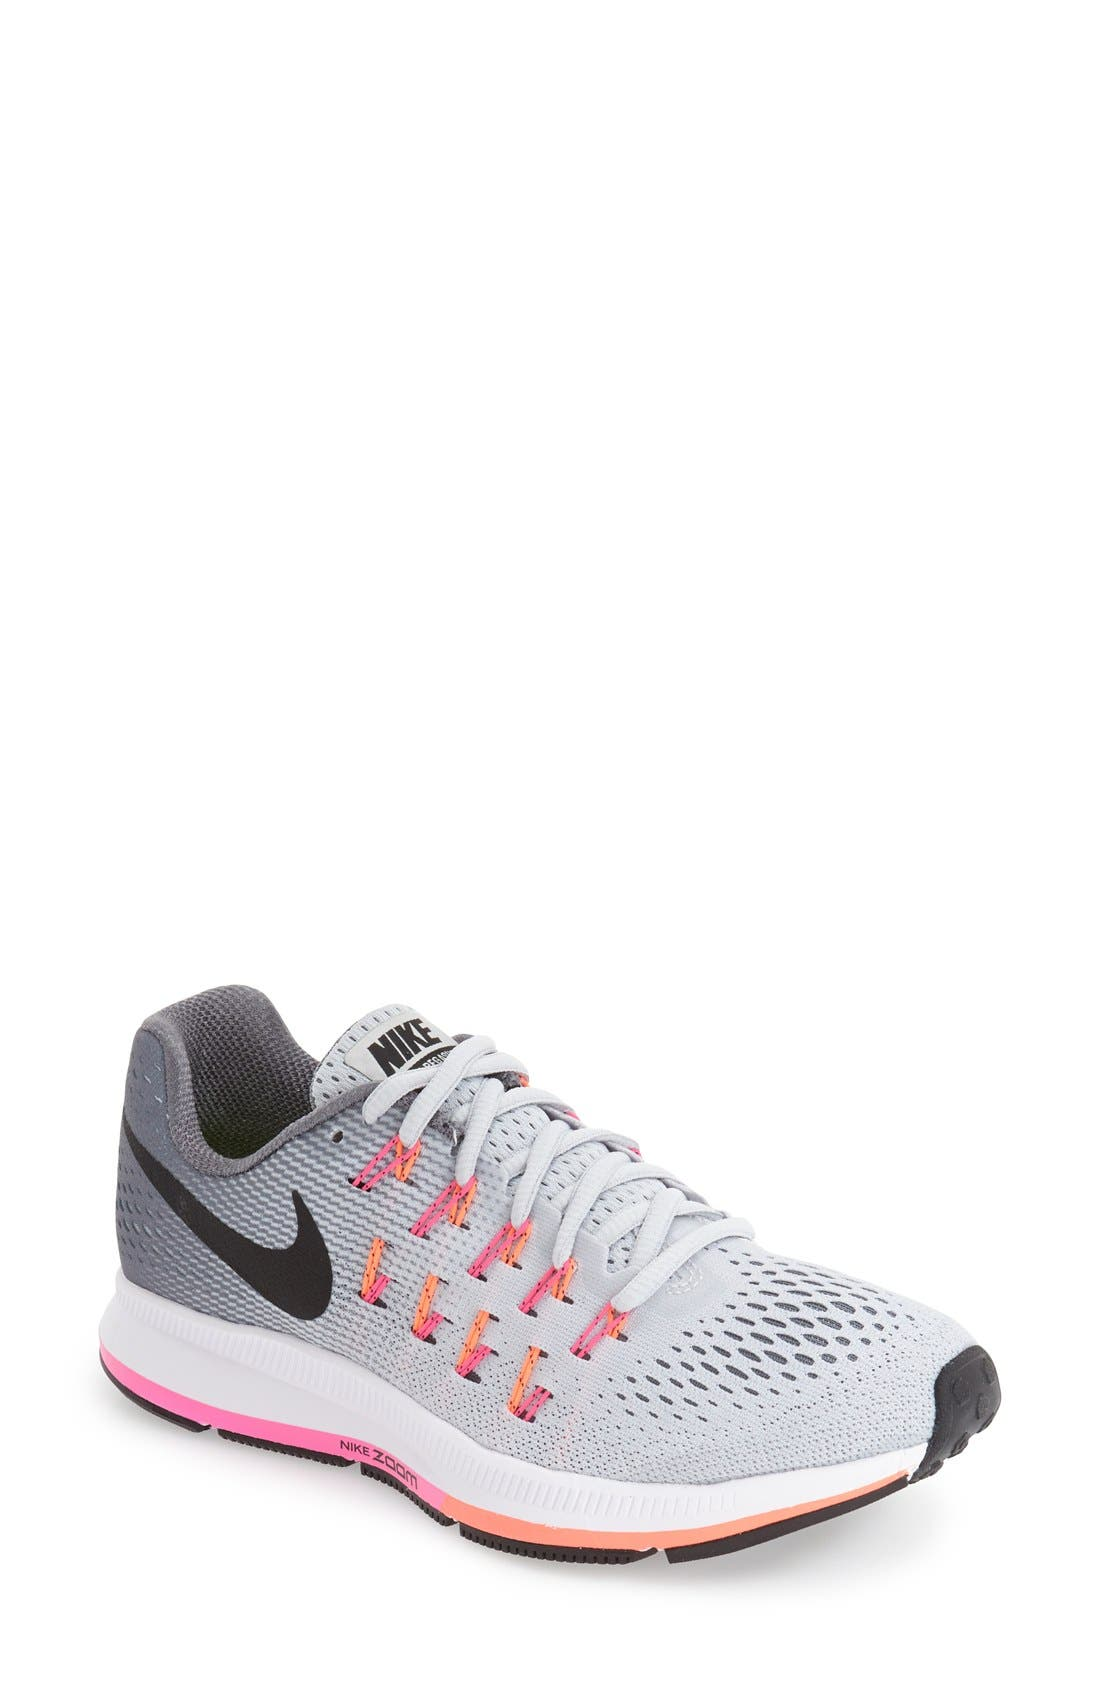 Nike Zoom Pegasus 33 Sneaker (Women)